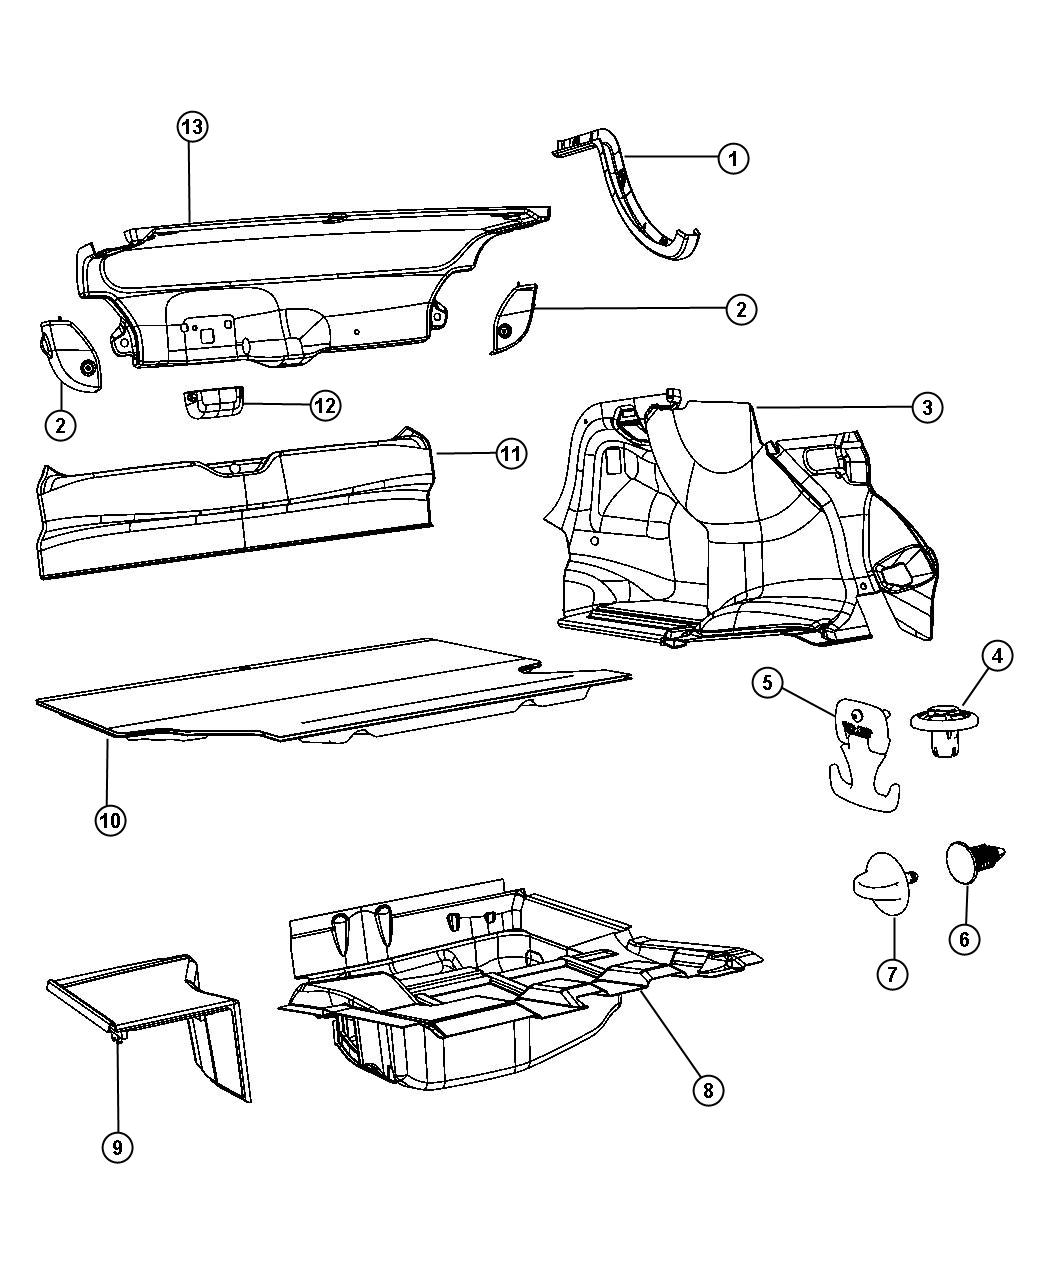 Dodge Charger Pin Push M8 3x19 00 Ahb